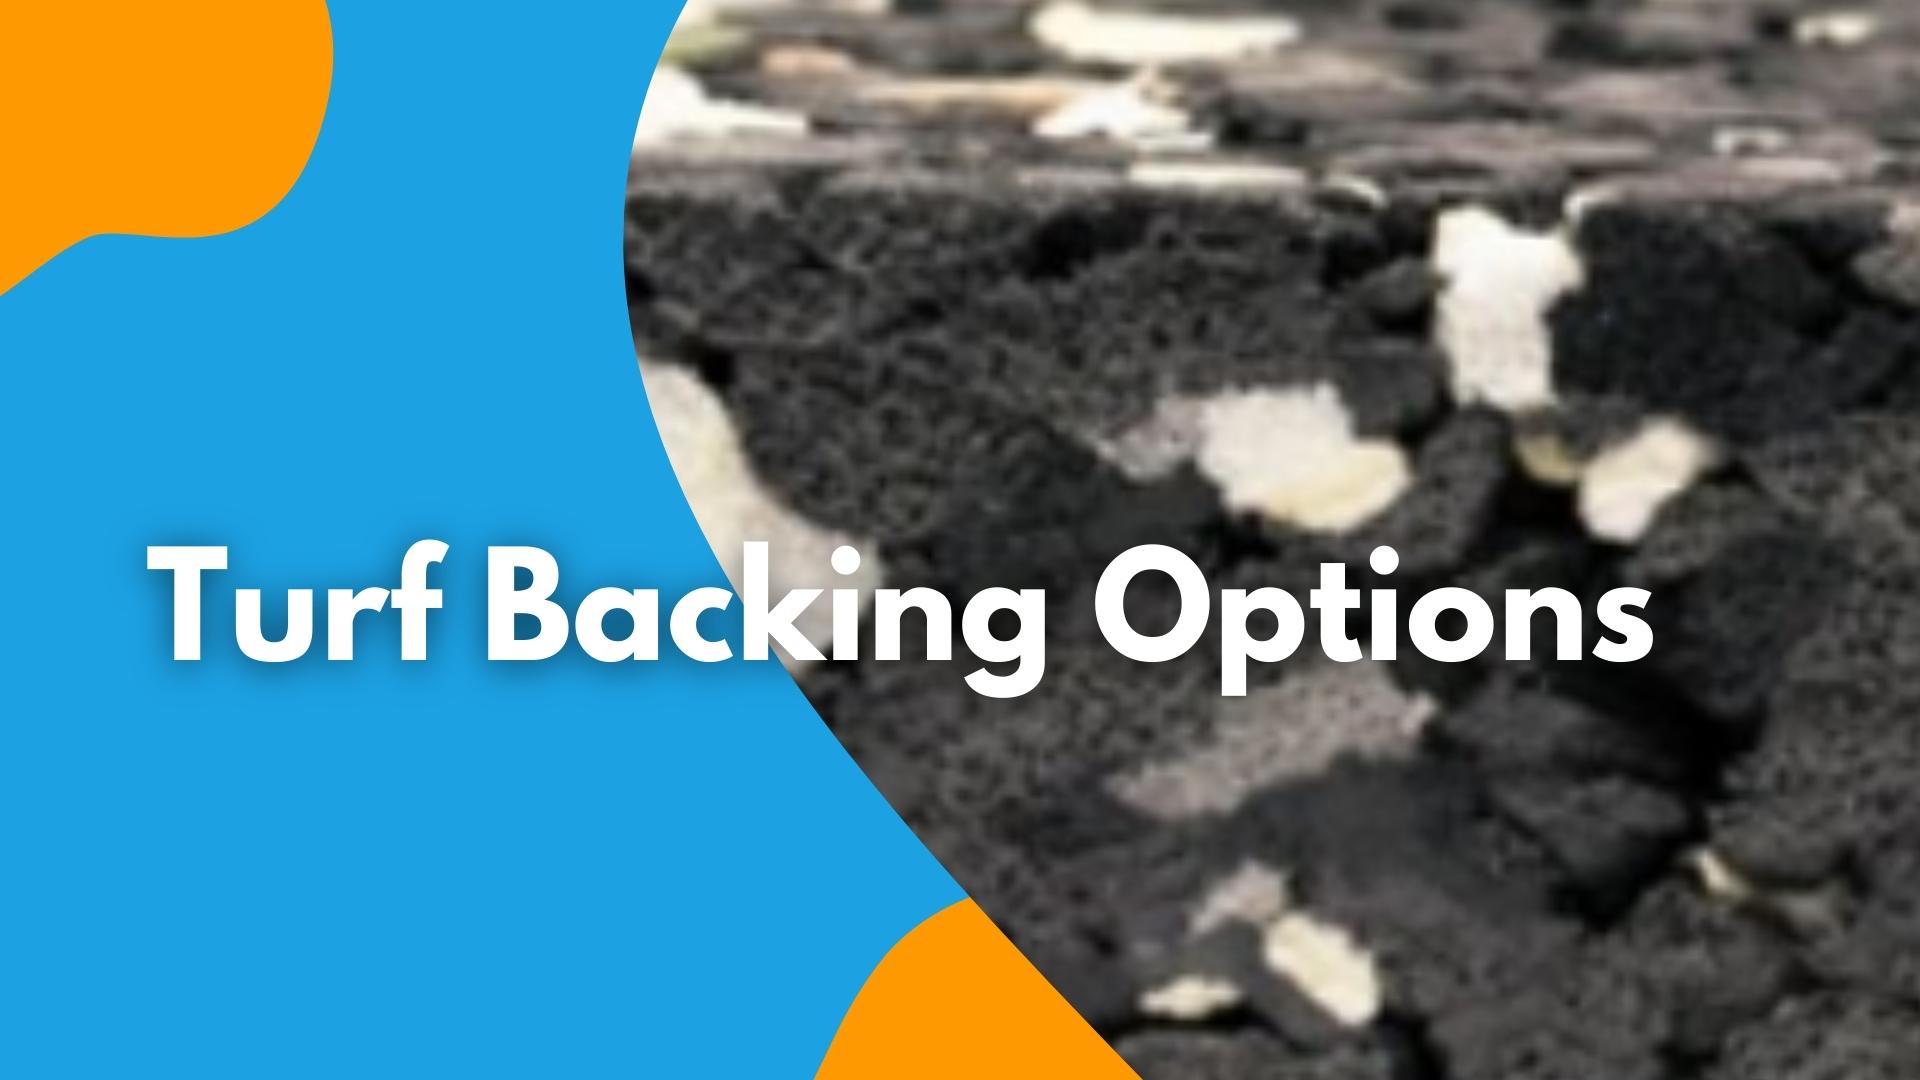 Turf Backing Options